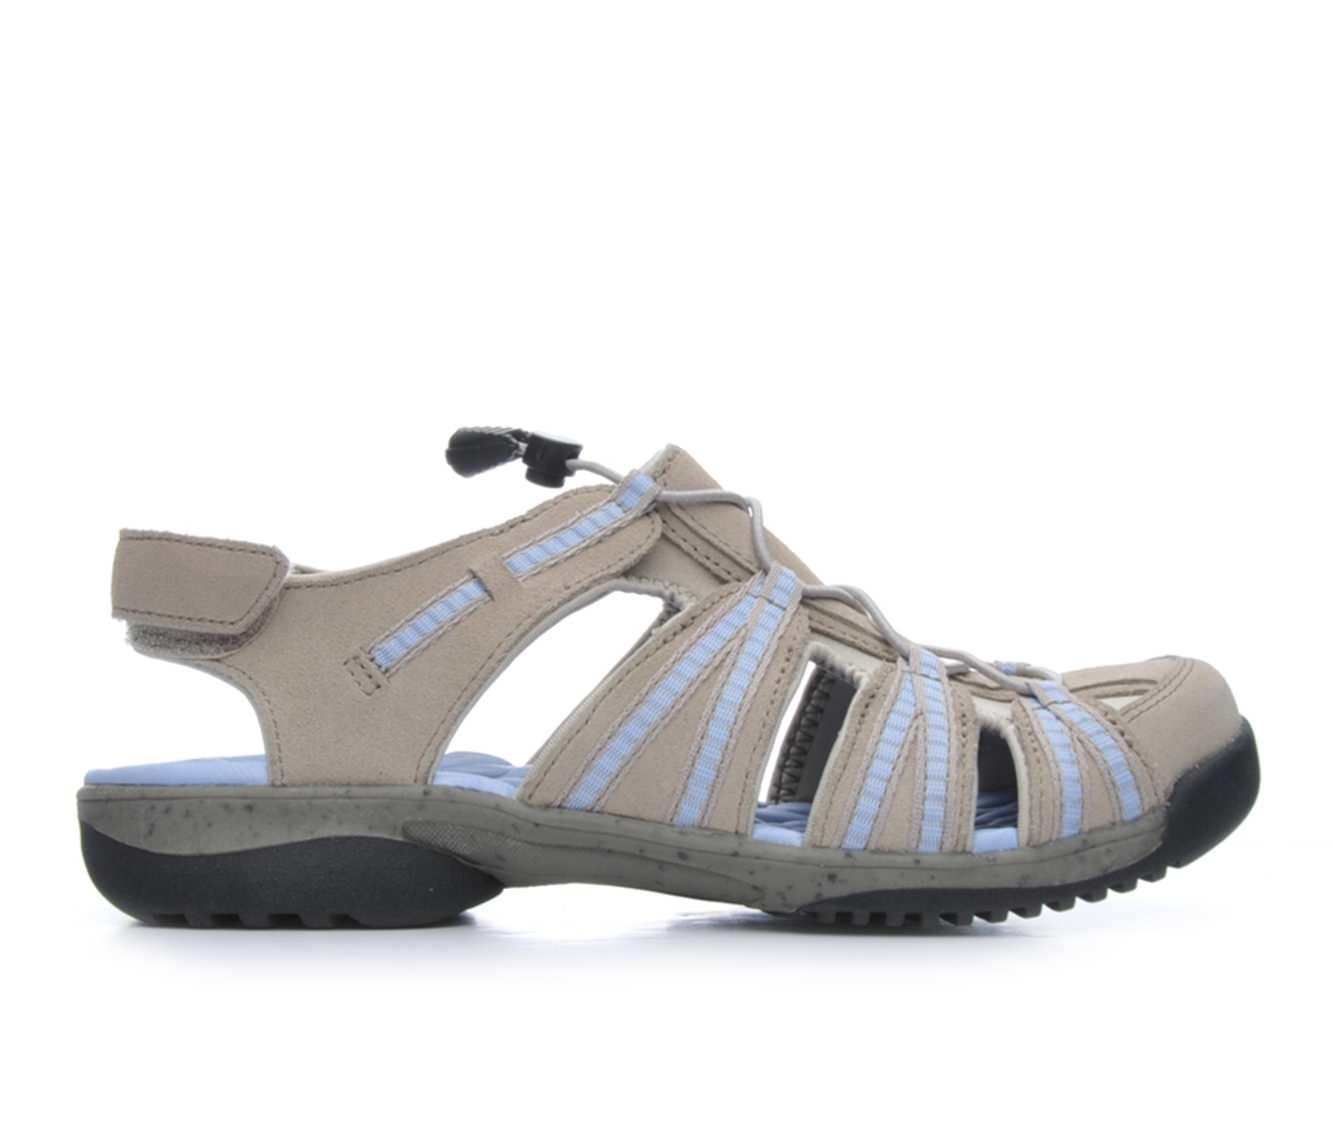 Women's Clarks Tuvia Maddee Sandals (Beige)